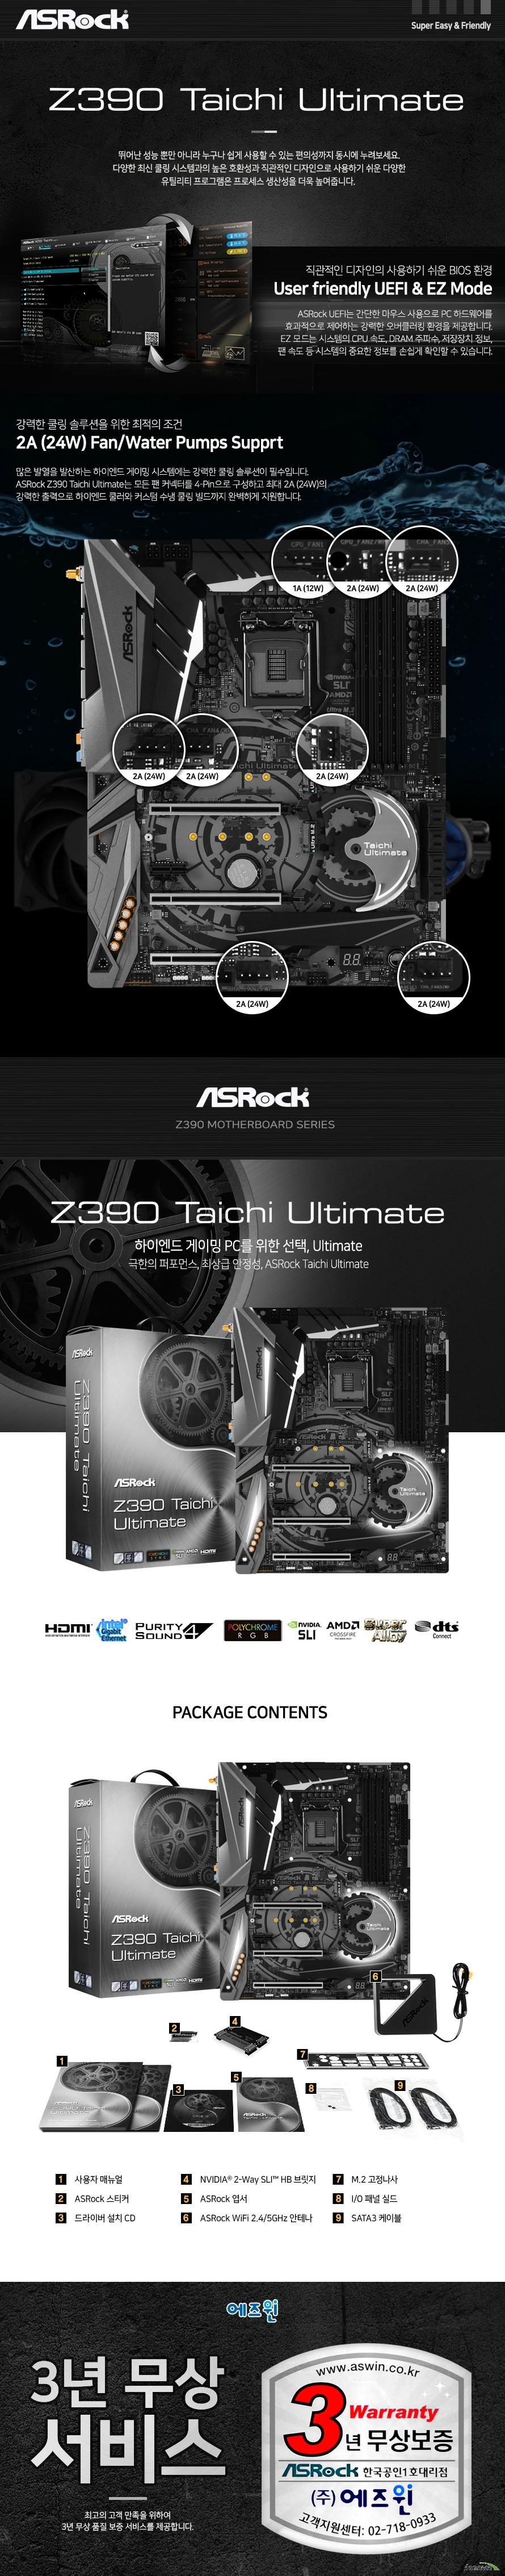 ASRock  Z390 TAICHI ULTIMATE 에즈윈